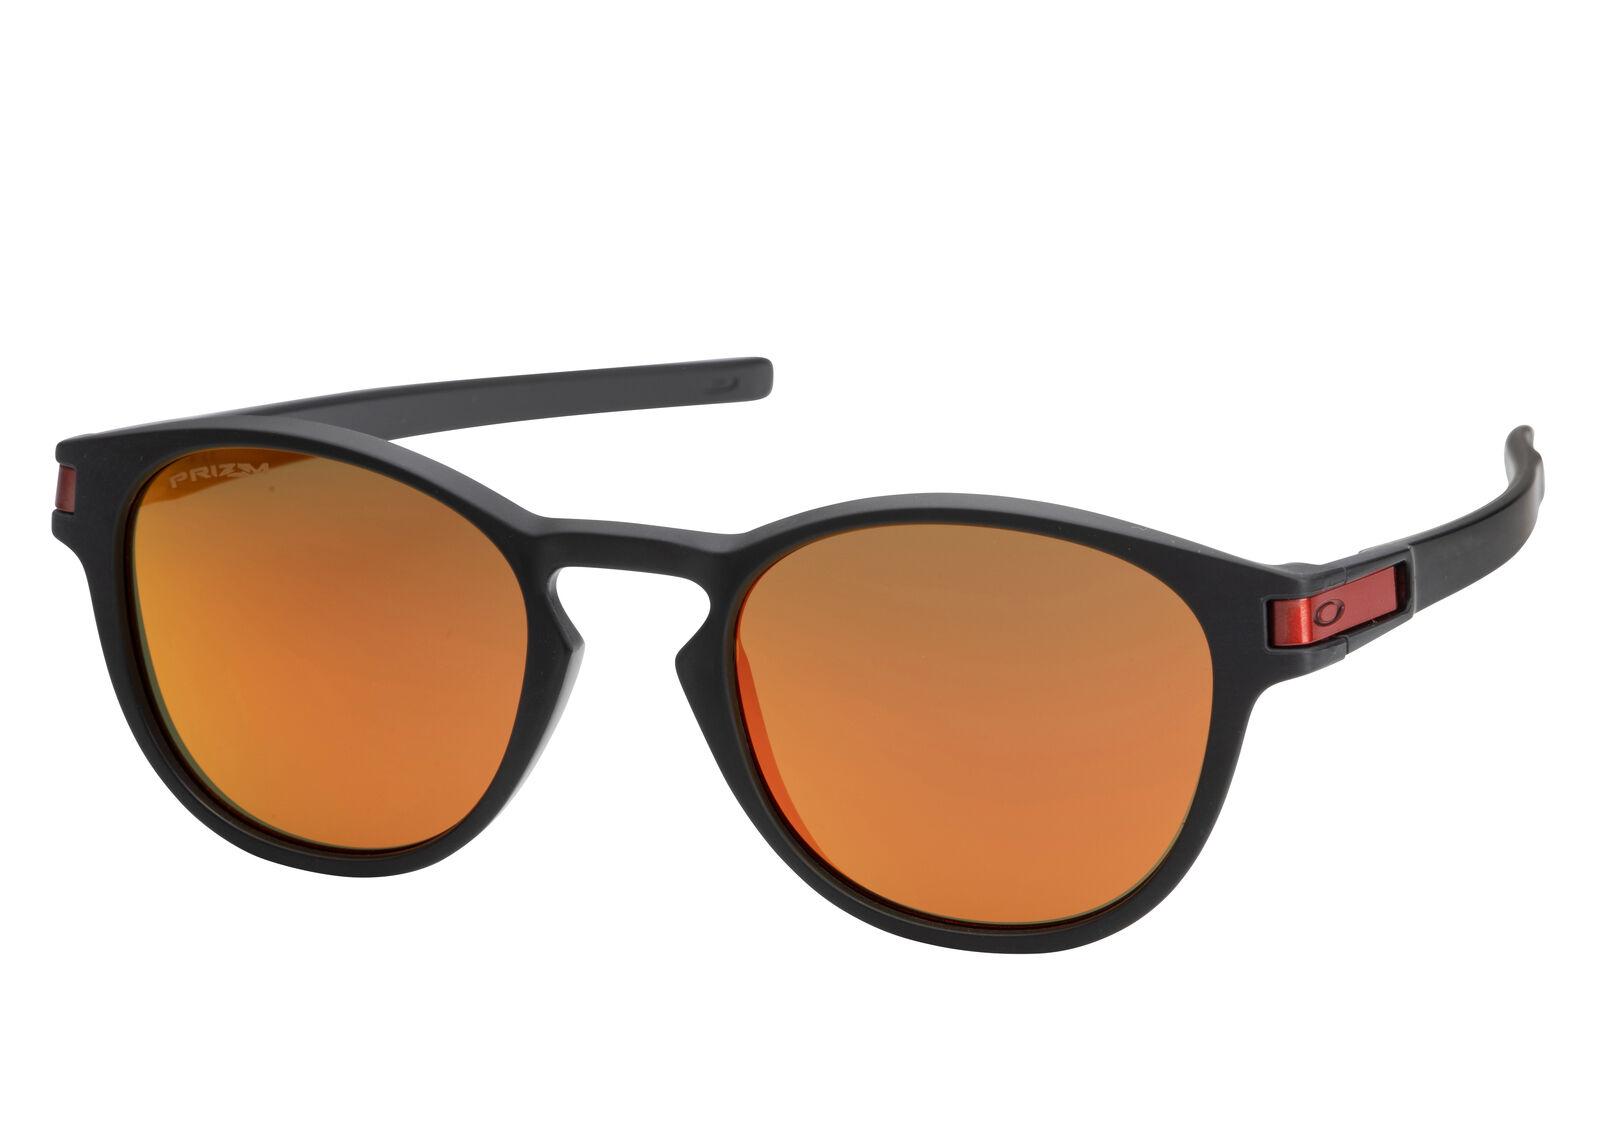 95ec8c0b86470 Oakley Latch Sunglasses Matte Black Prizm Ruby OO9265-29 9265 29 ...